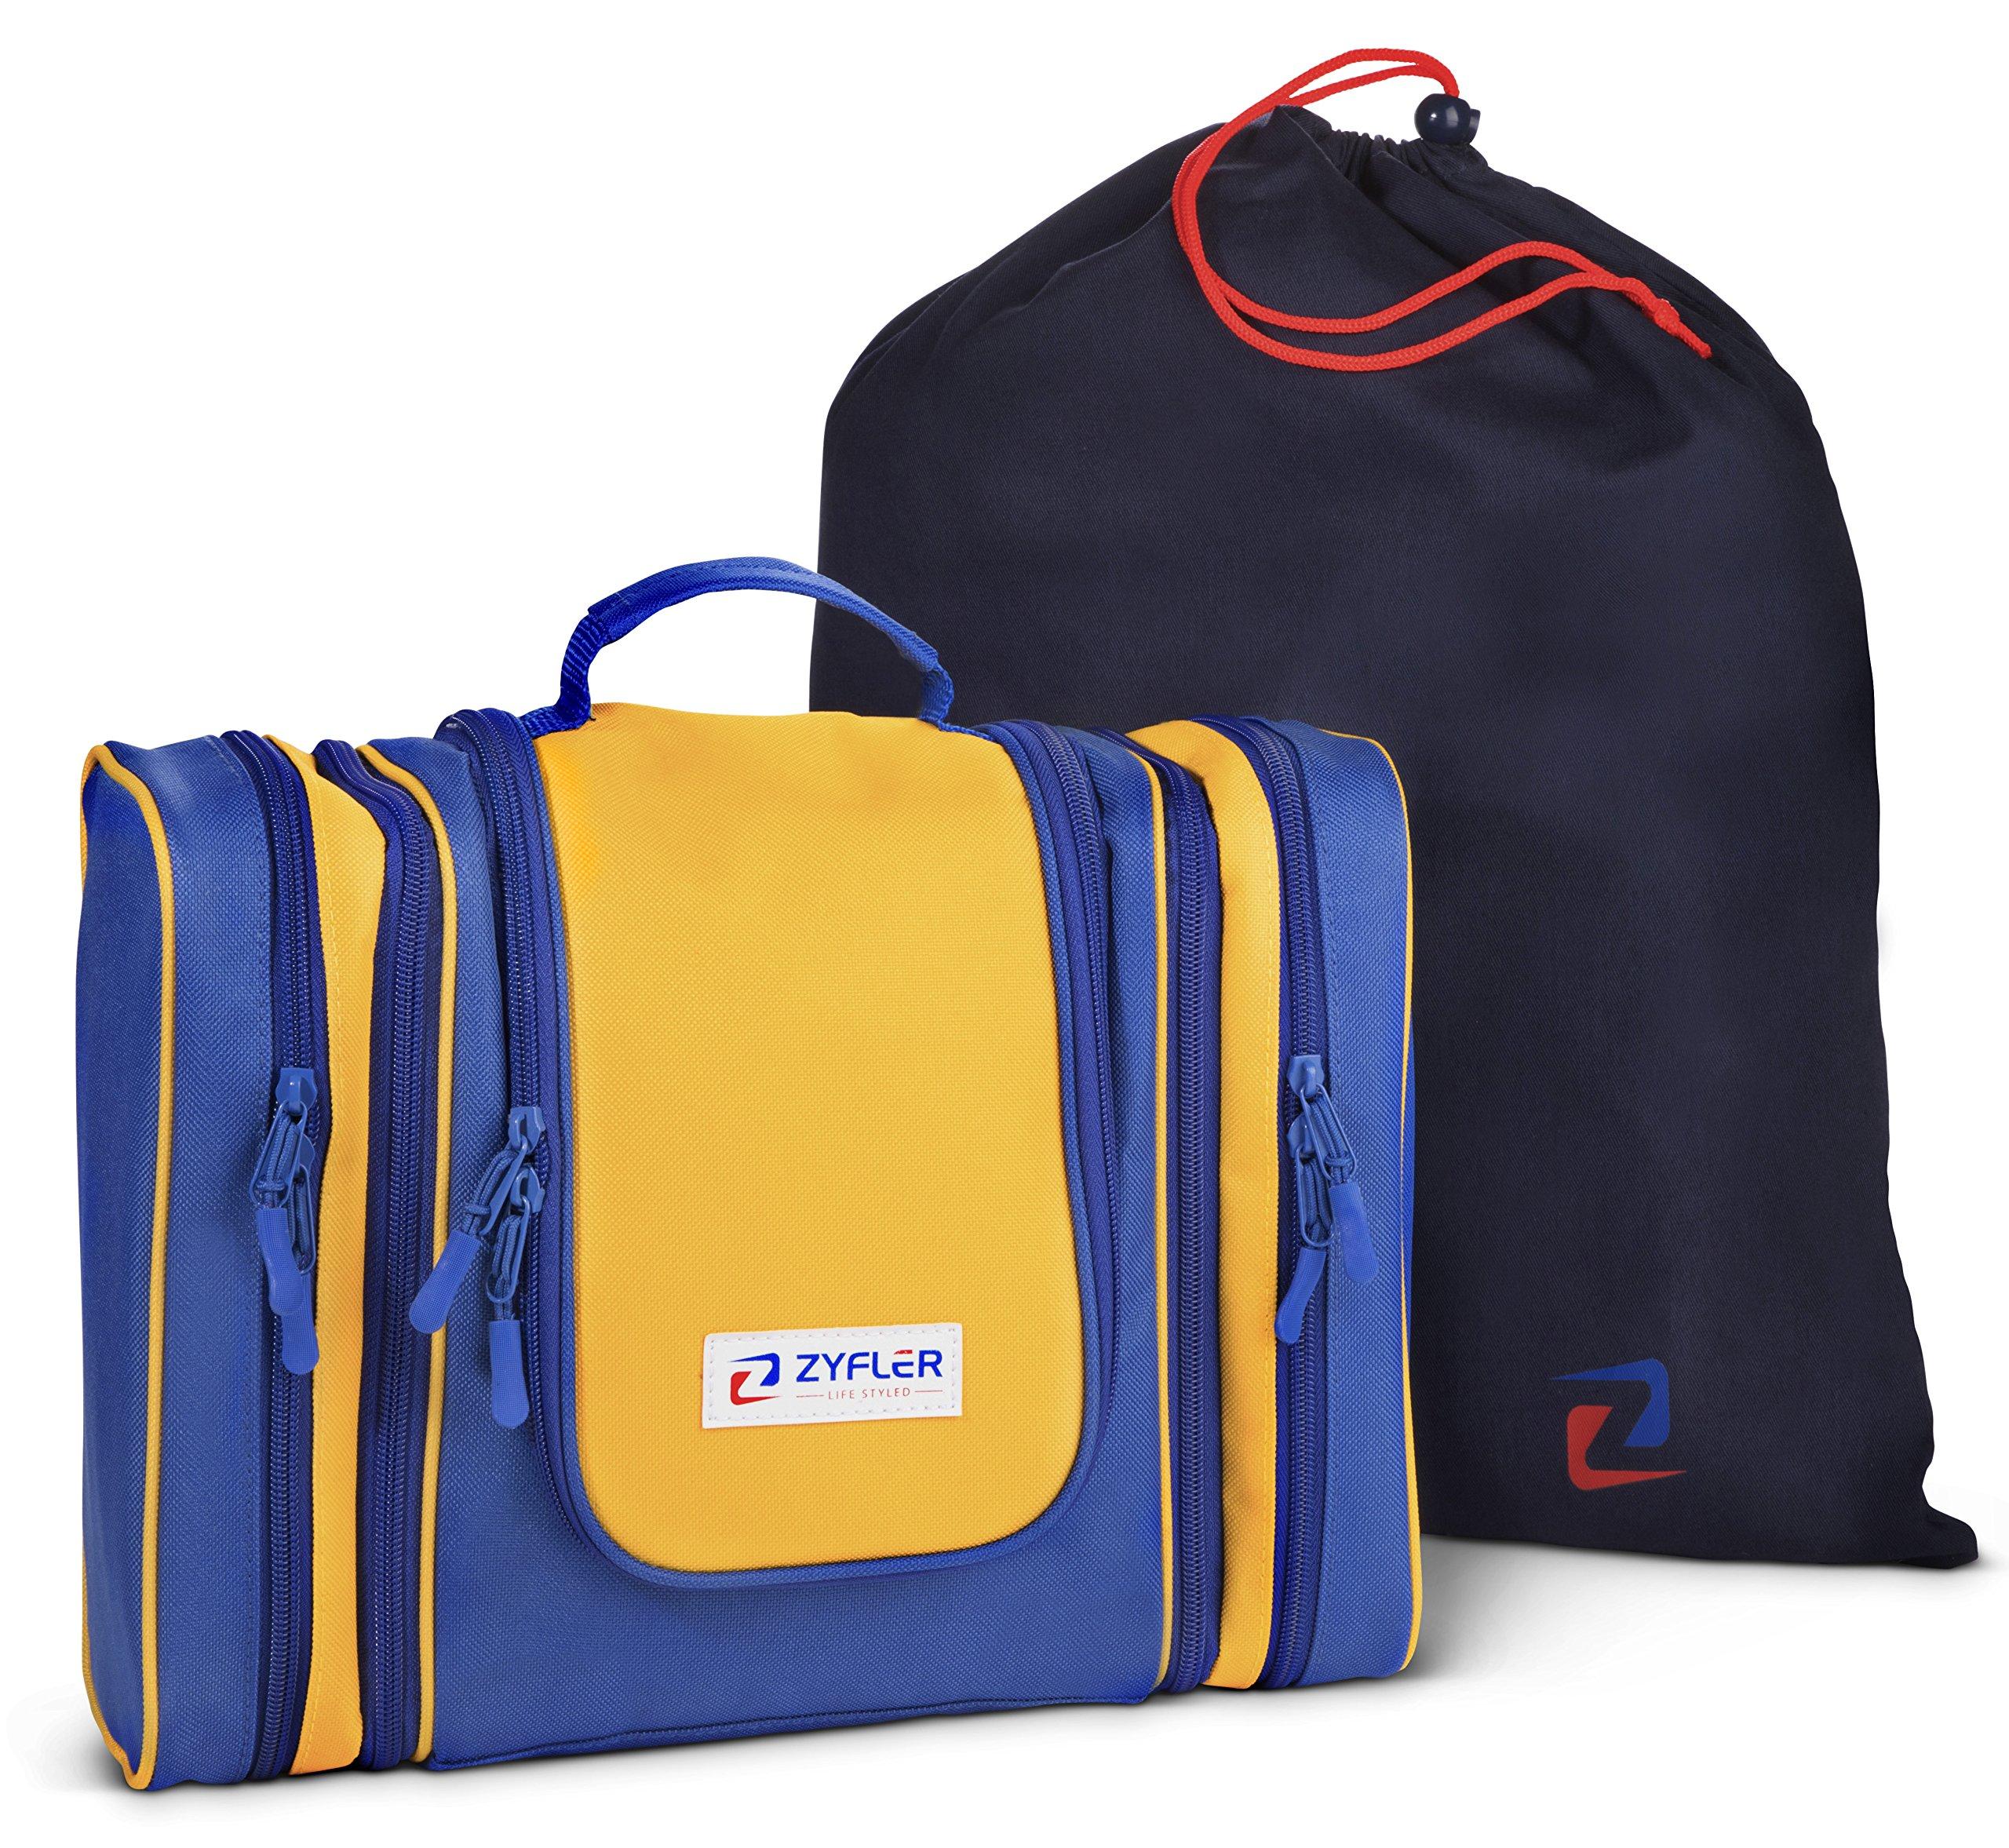 amazon com detachable hanging toiletry bag and organizer by rh amazon com